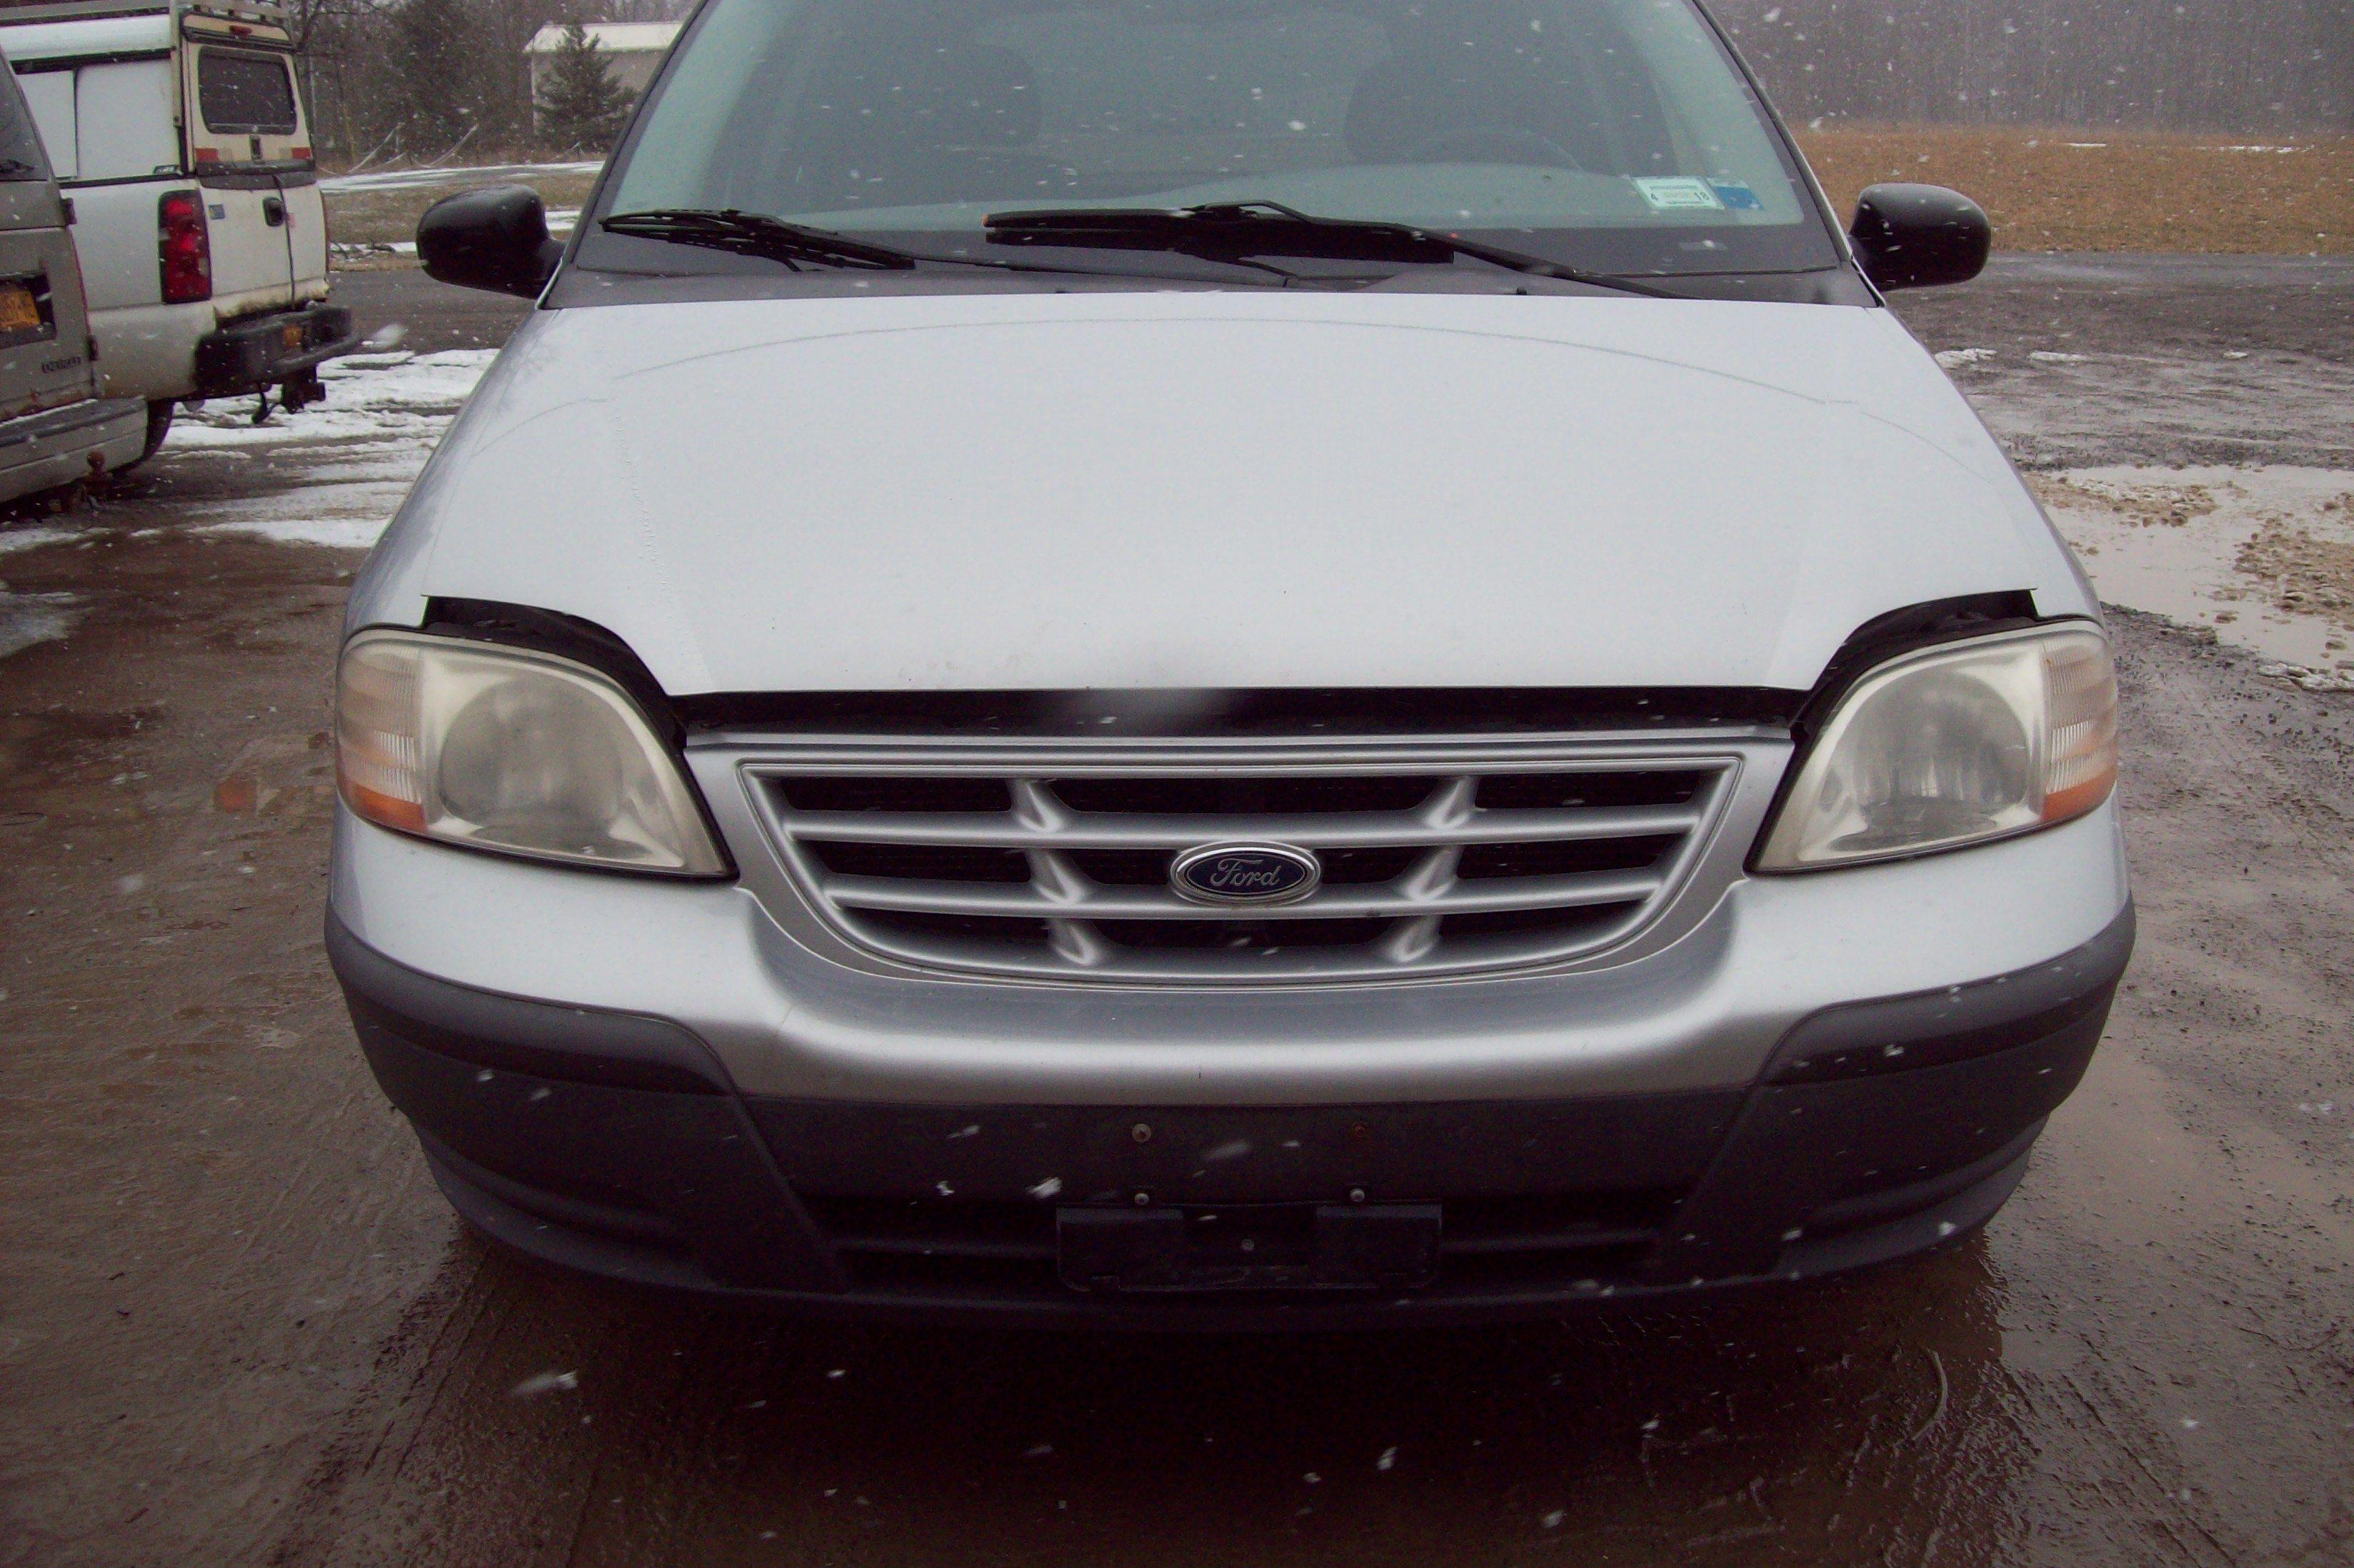 Ford Windstar Loaded Beam Axle Used Mini Van Parts 2003 Sel A79e4d38814f4a2a90112f614643e704008